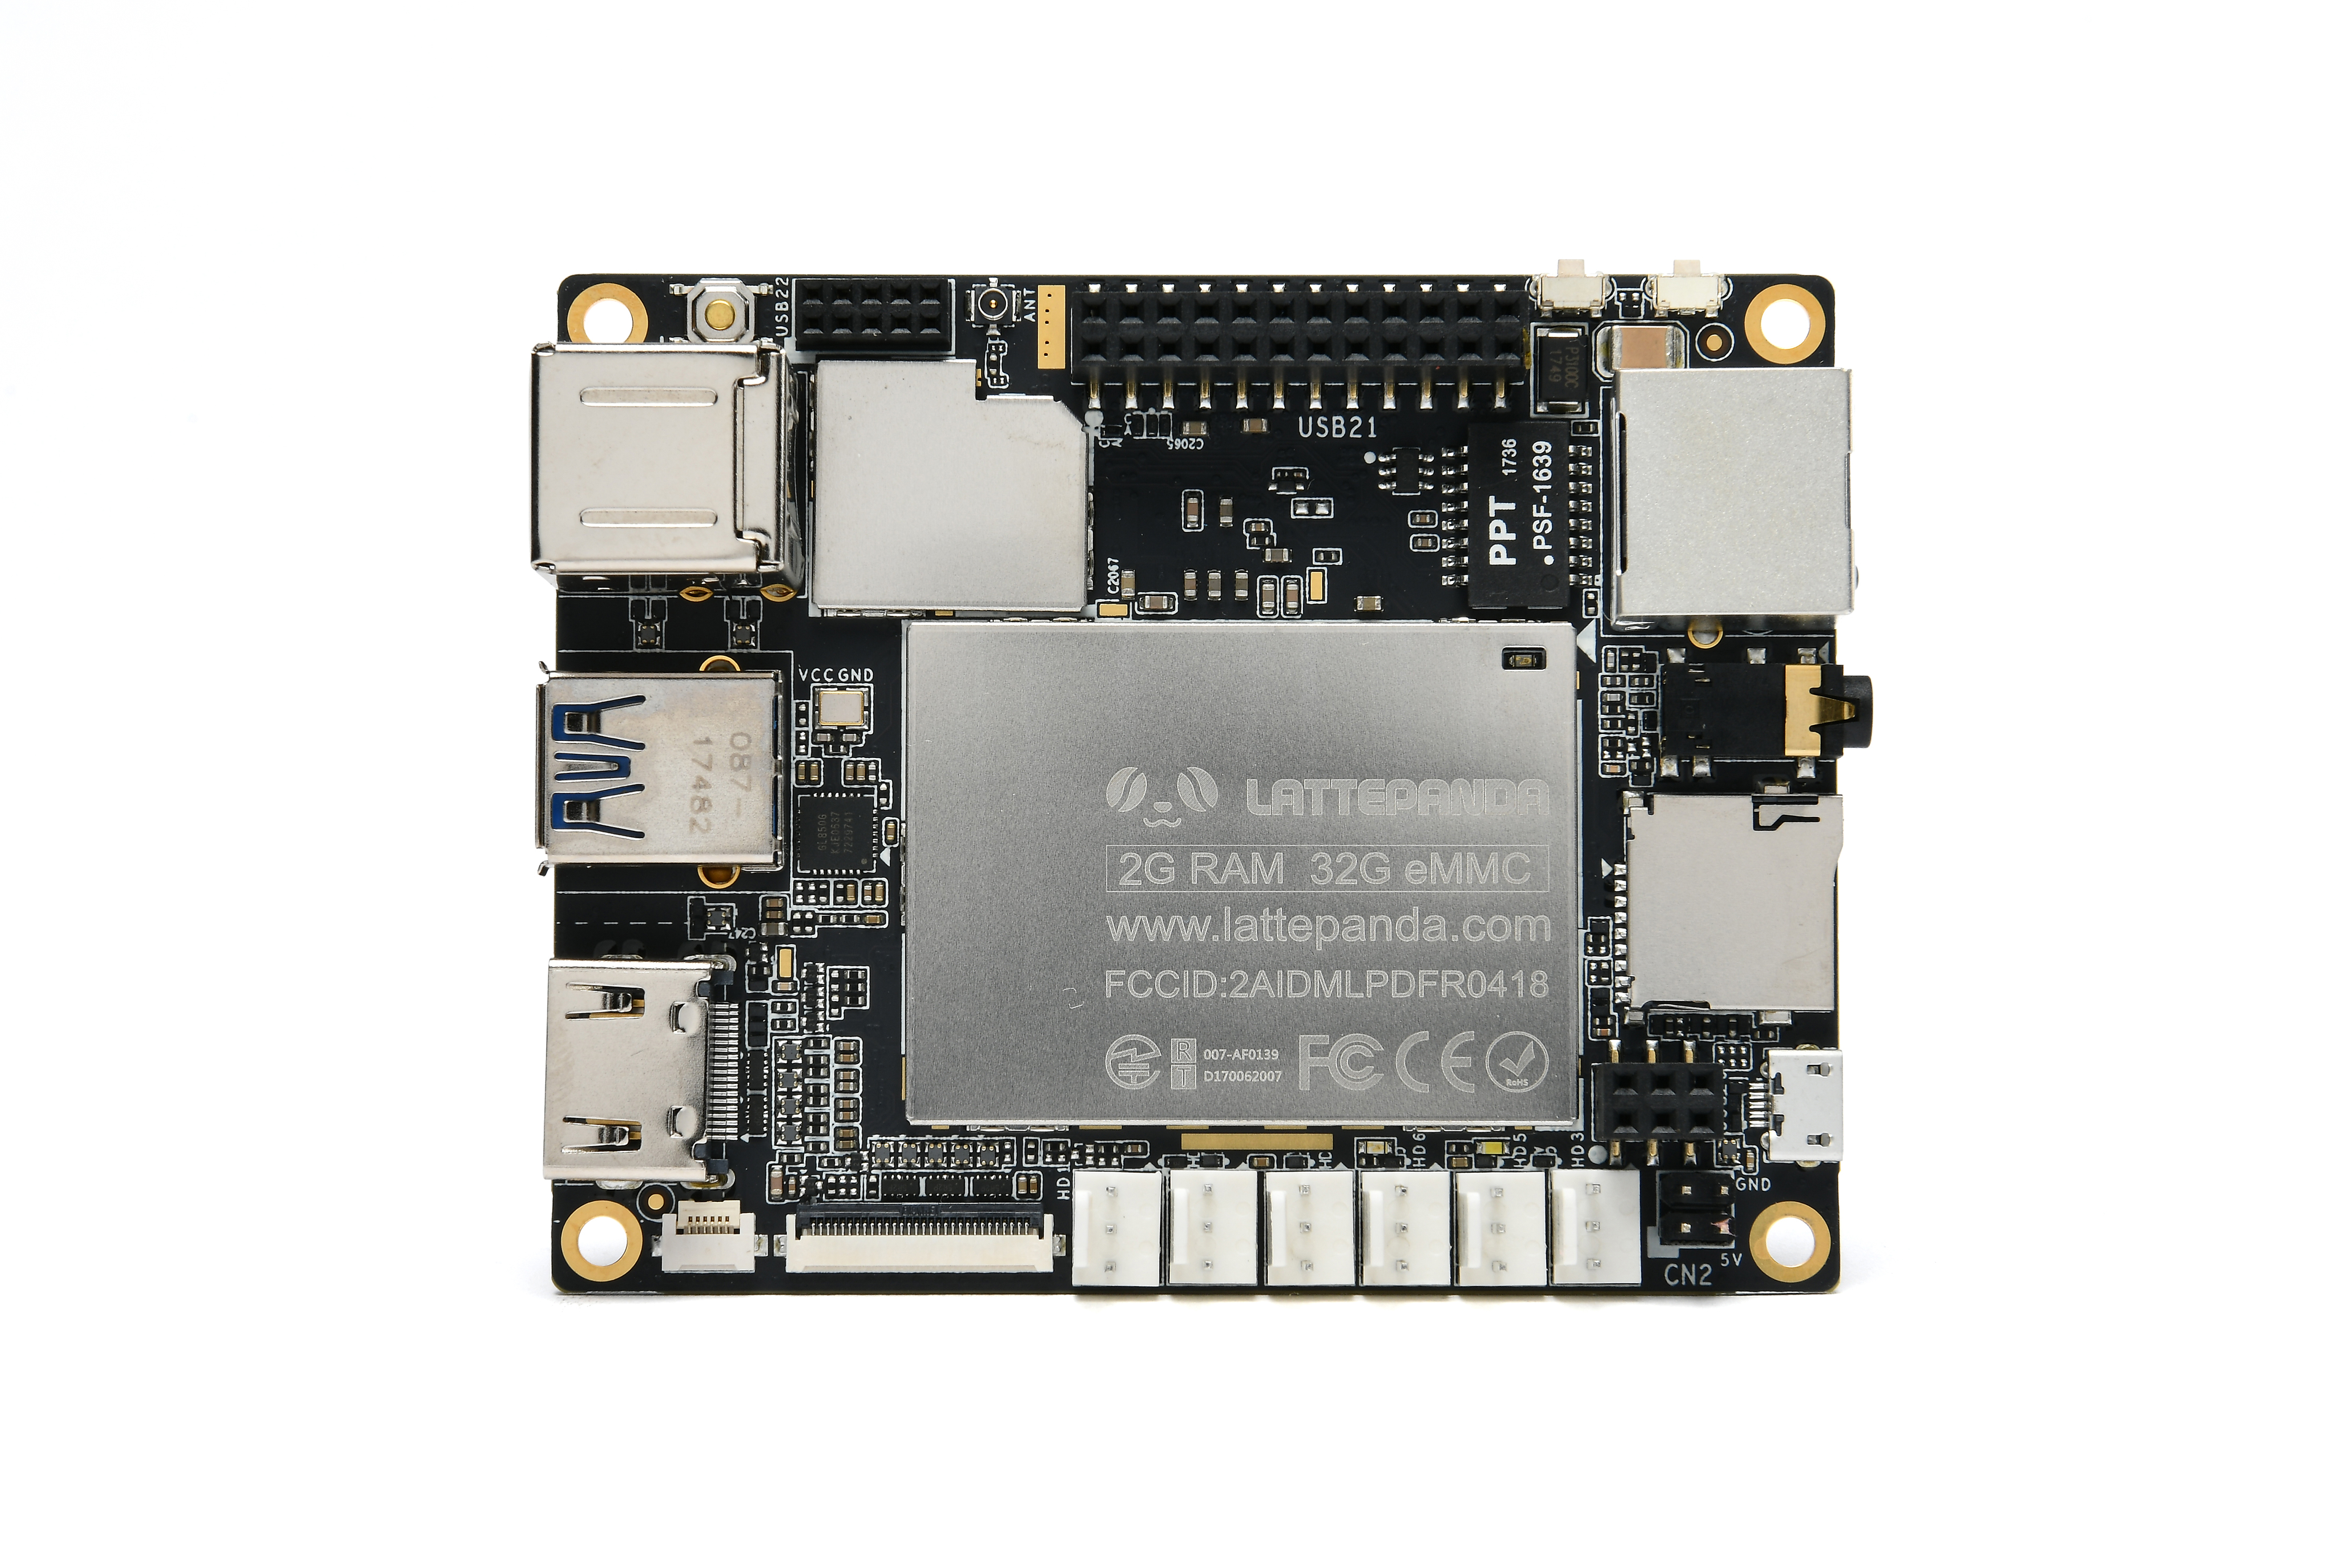 LattePanda 2 GB/32 GB-computer zonder licentie